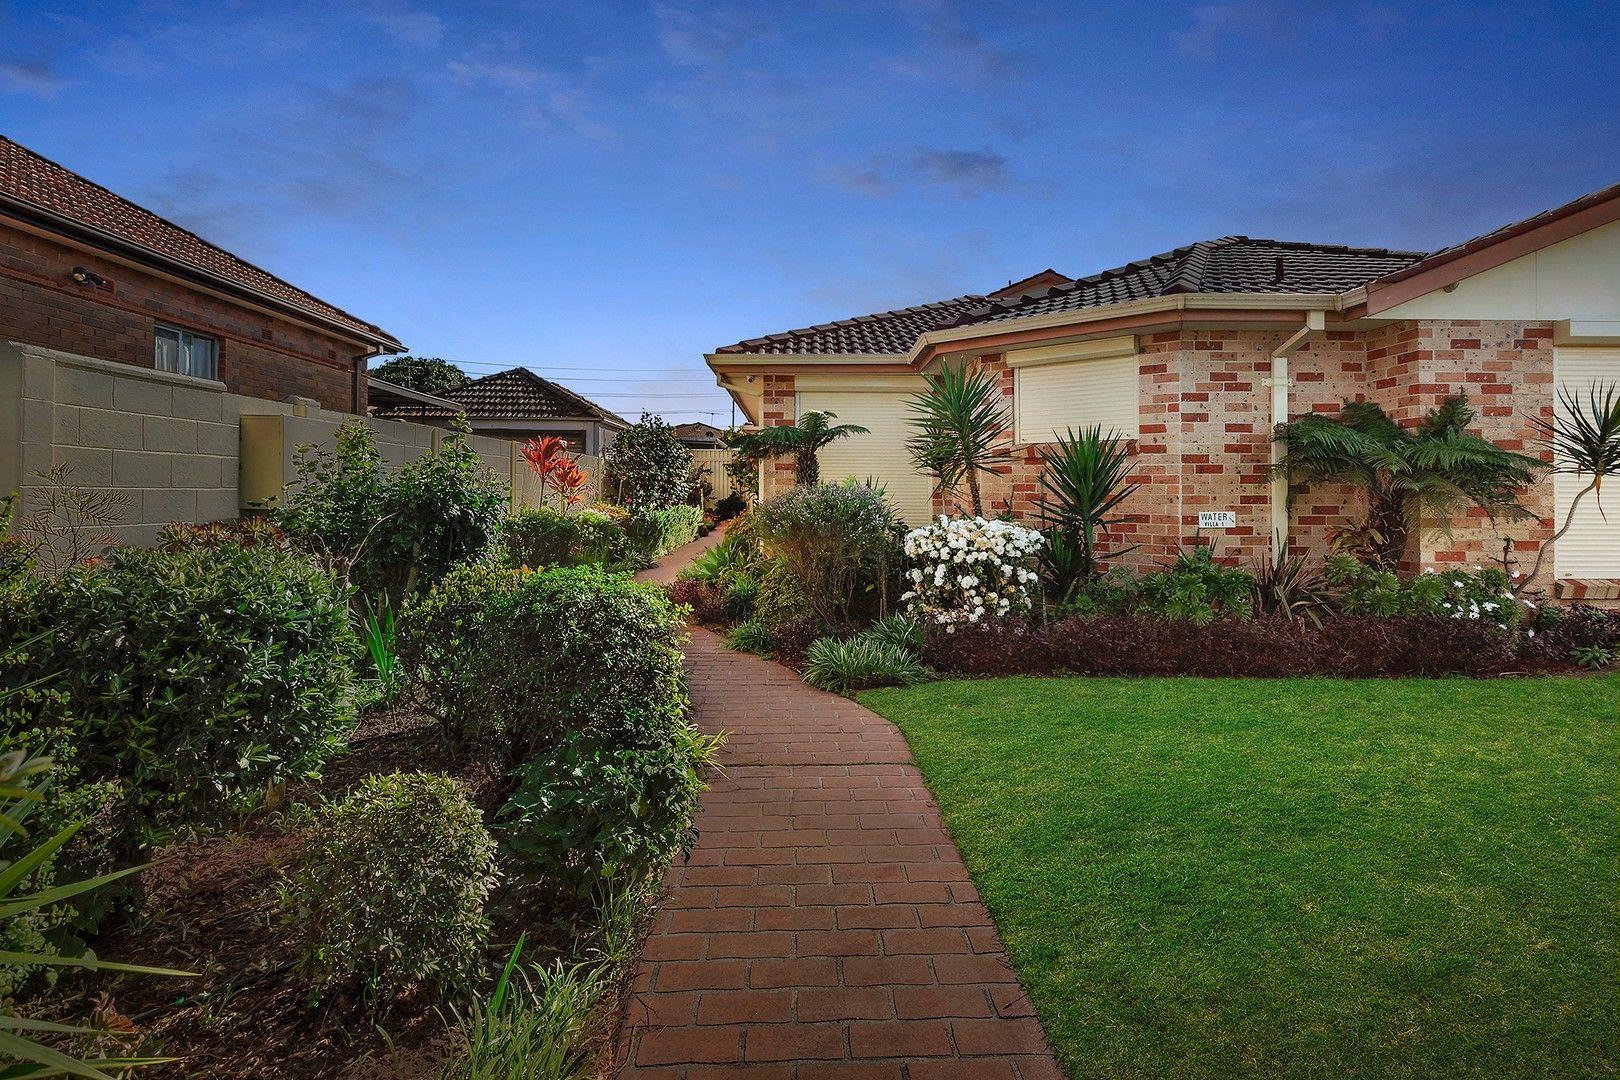 2/14 Russell Avenue, Sans Souci NSW 2219, Image 0